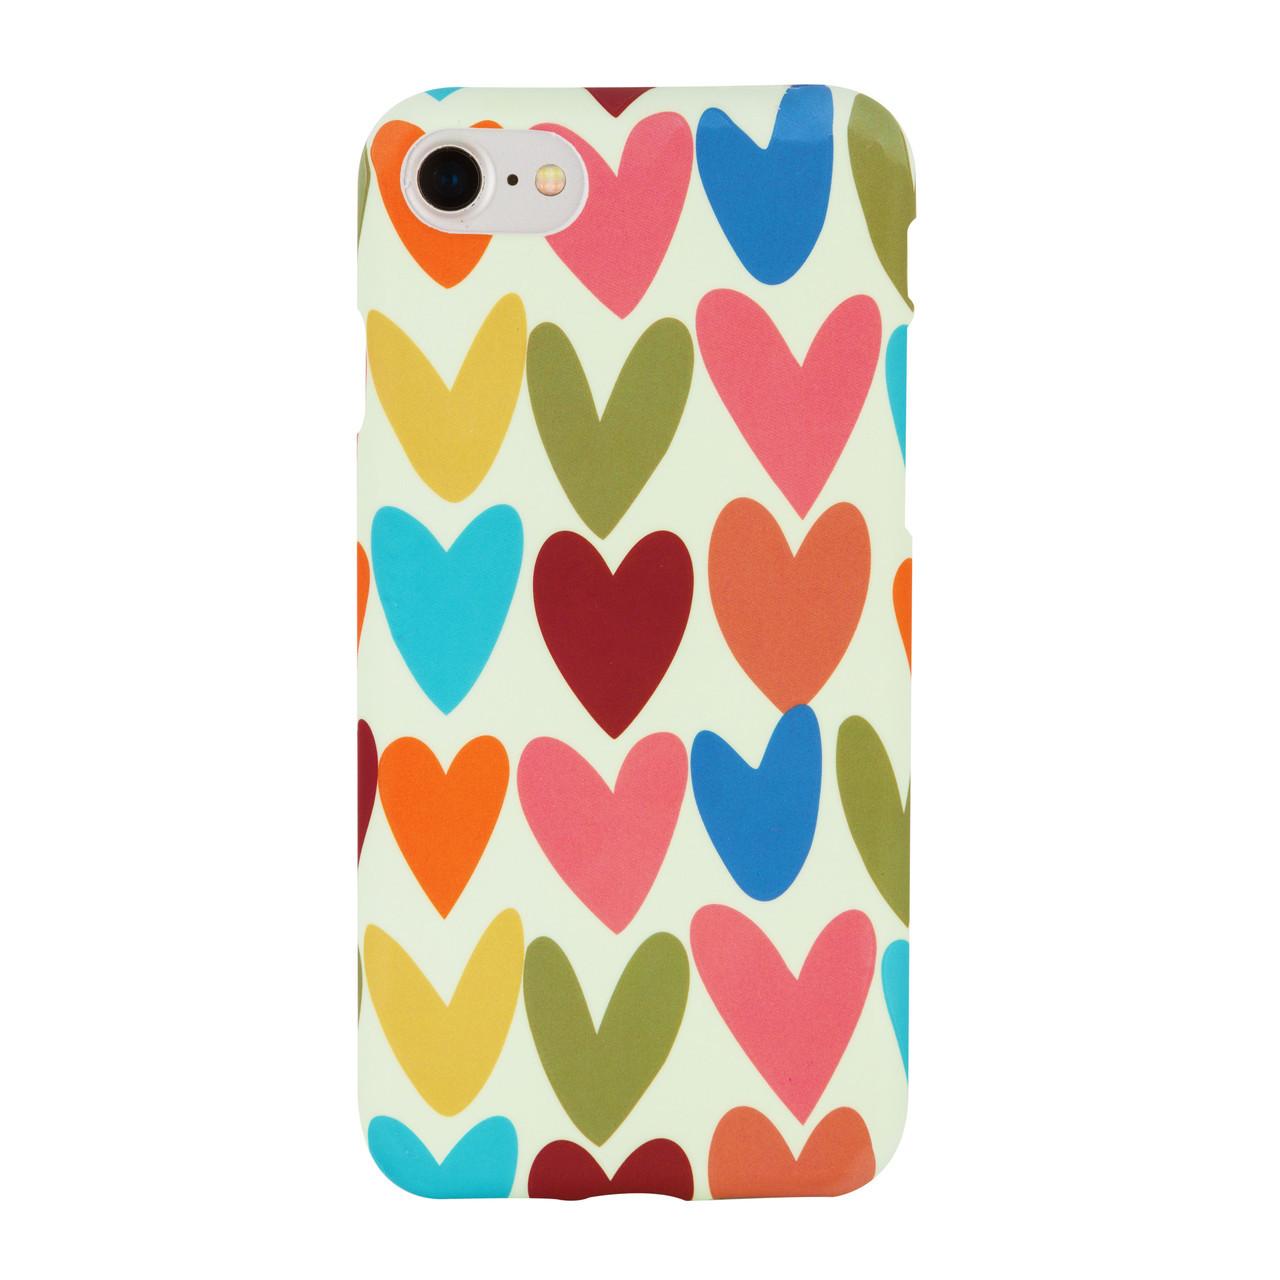 Чехол Oovi для iPhone 7/8 Plus Big Hearts (56561)